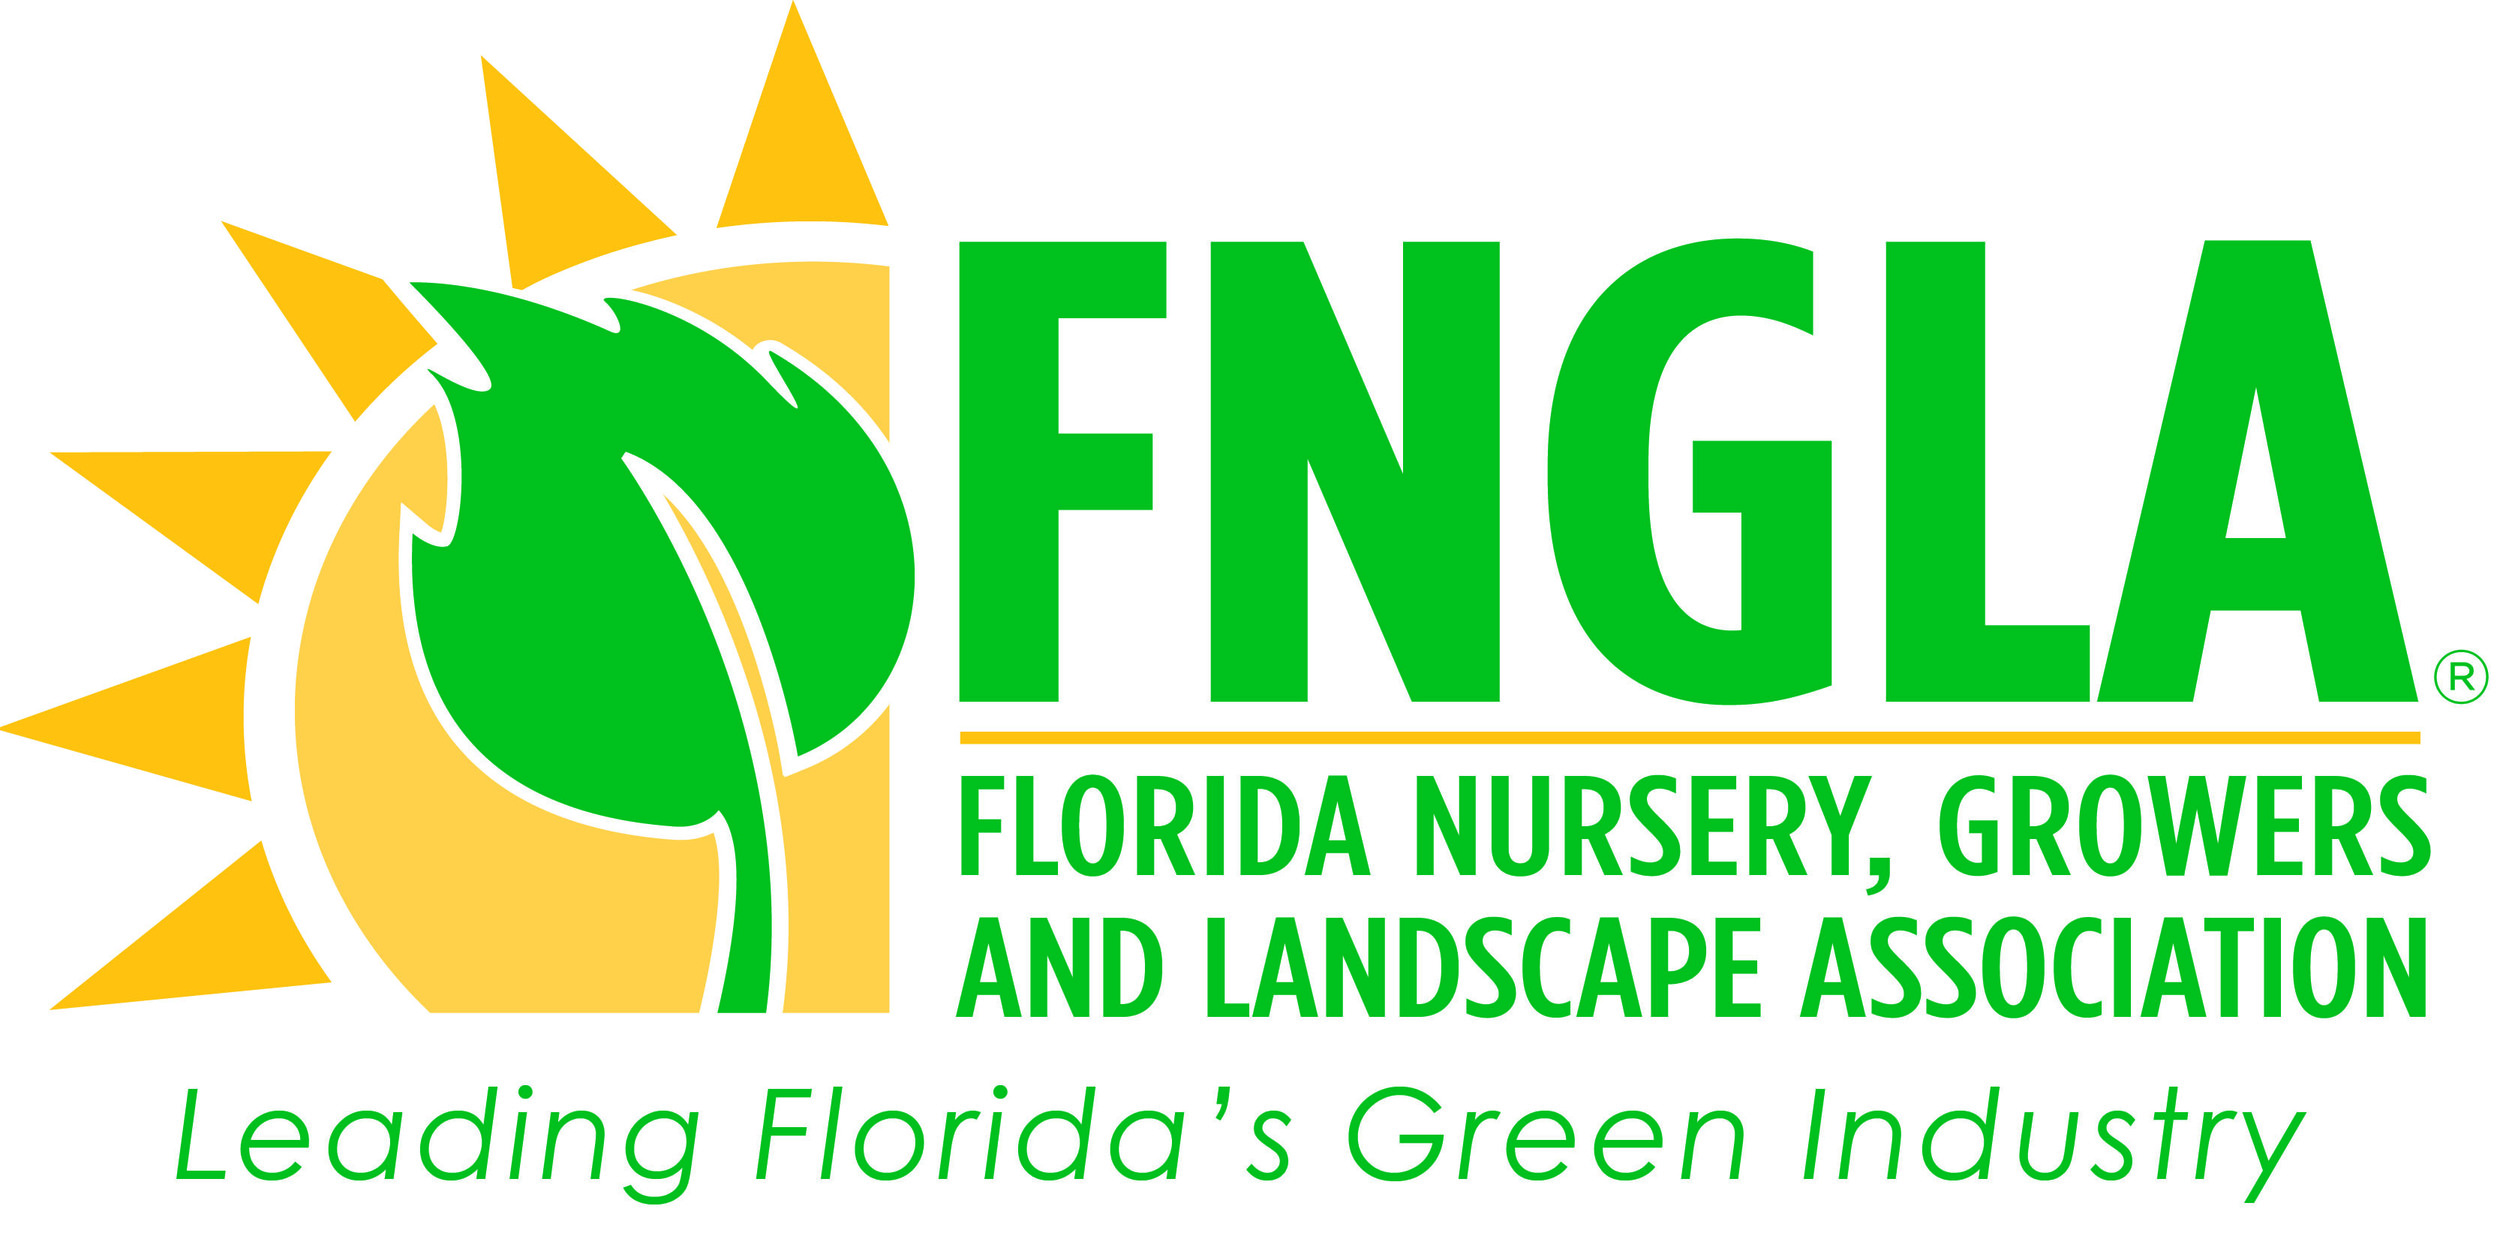 FNGLA_logo_cmyk_300.jpg